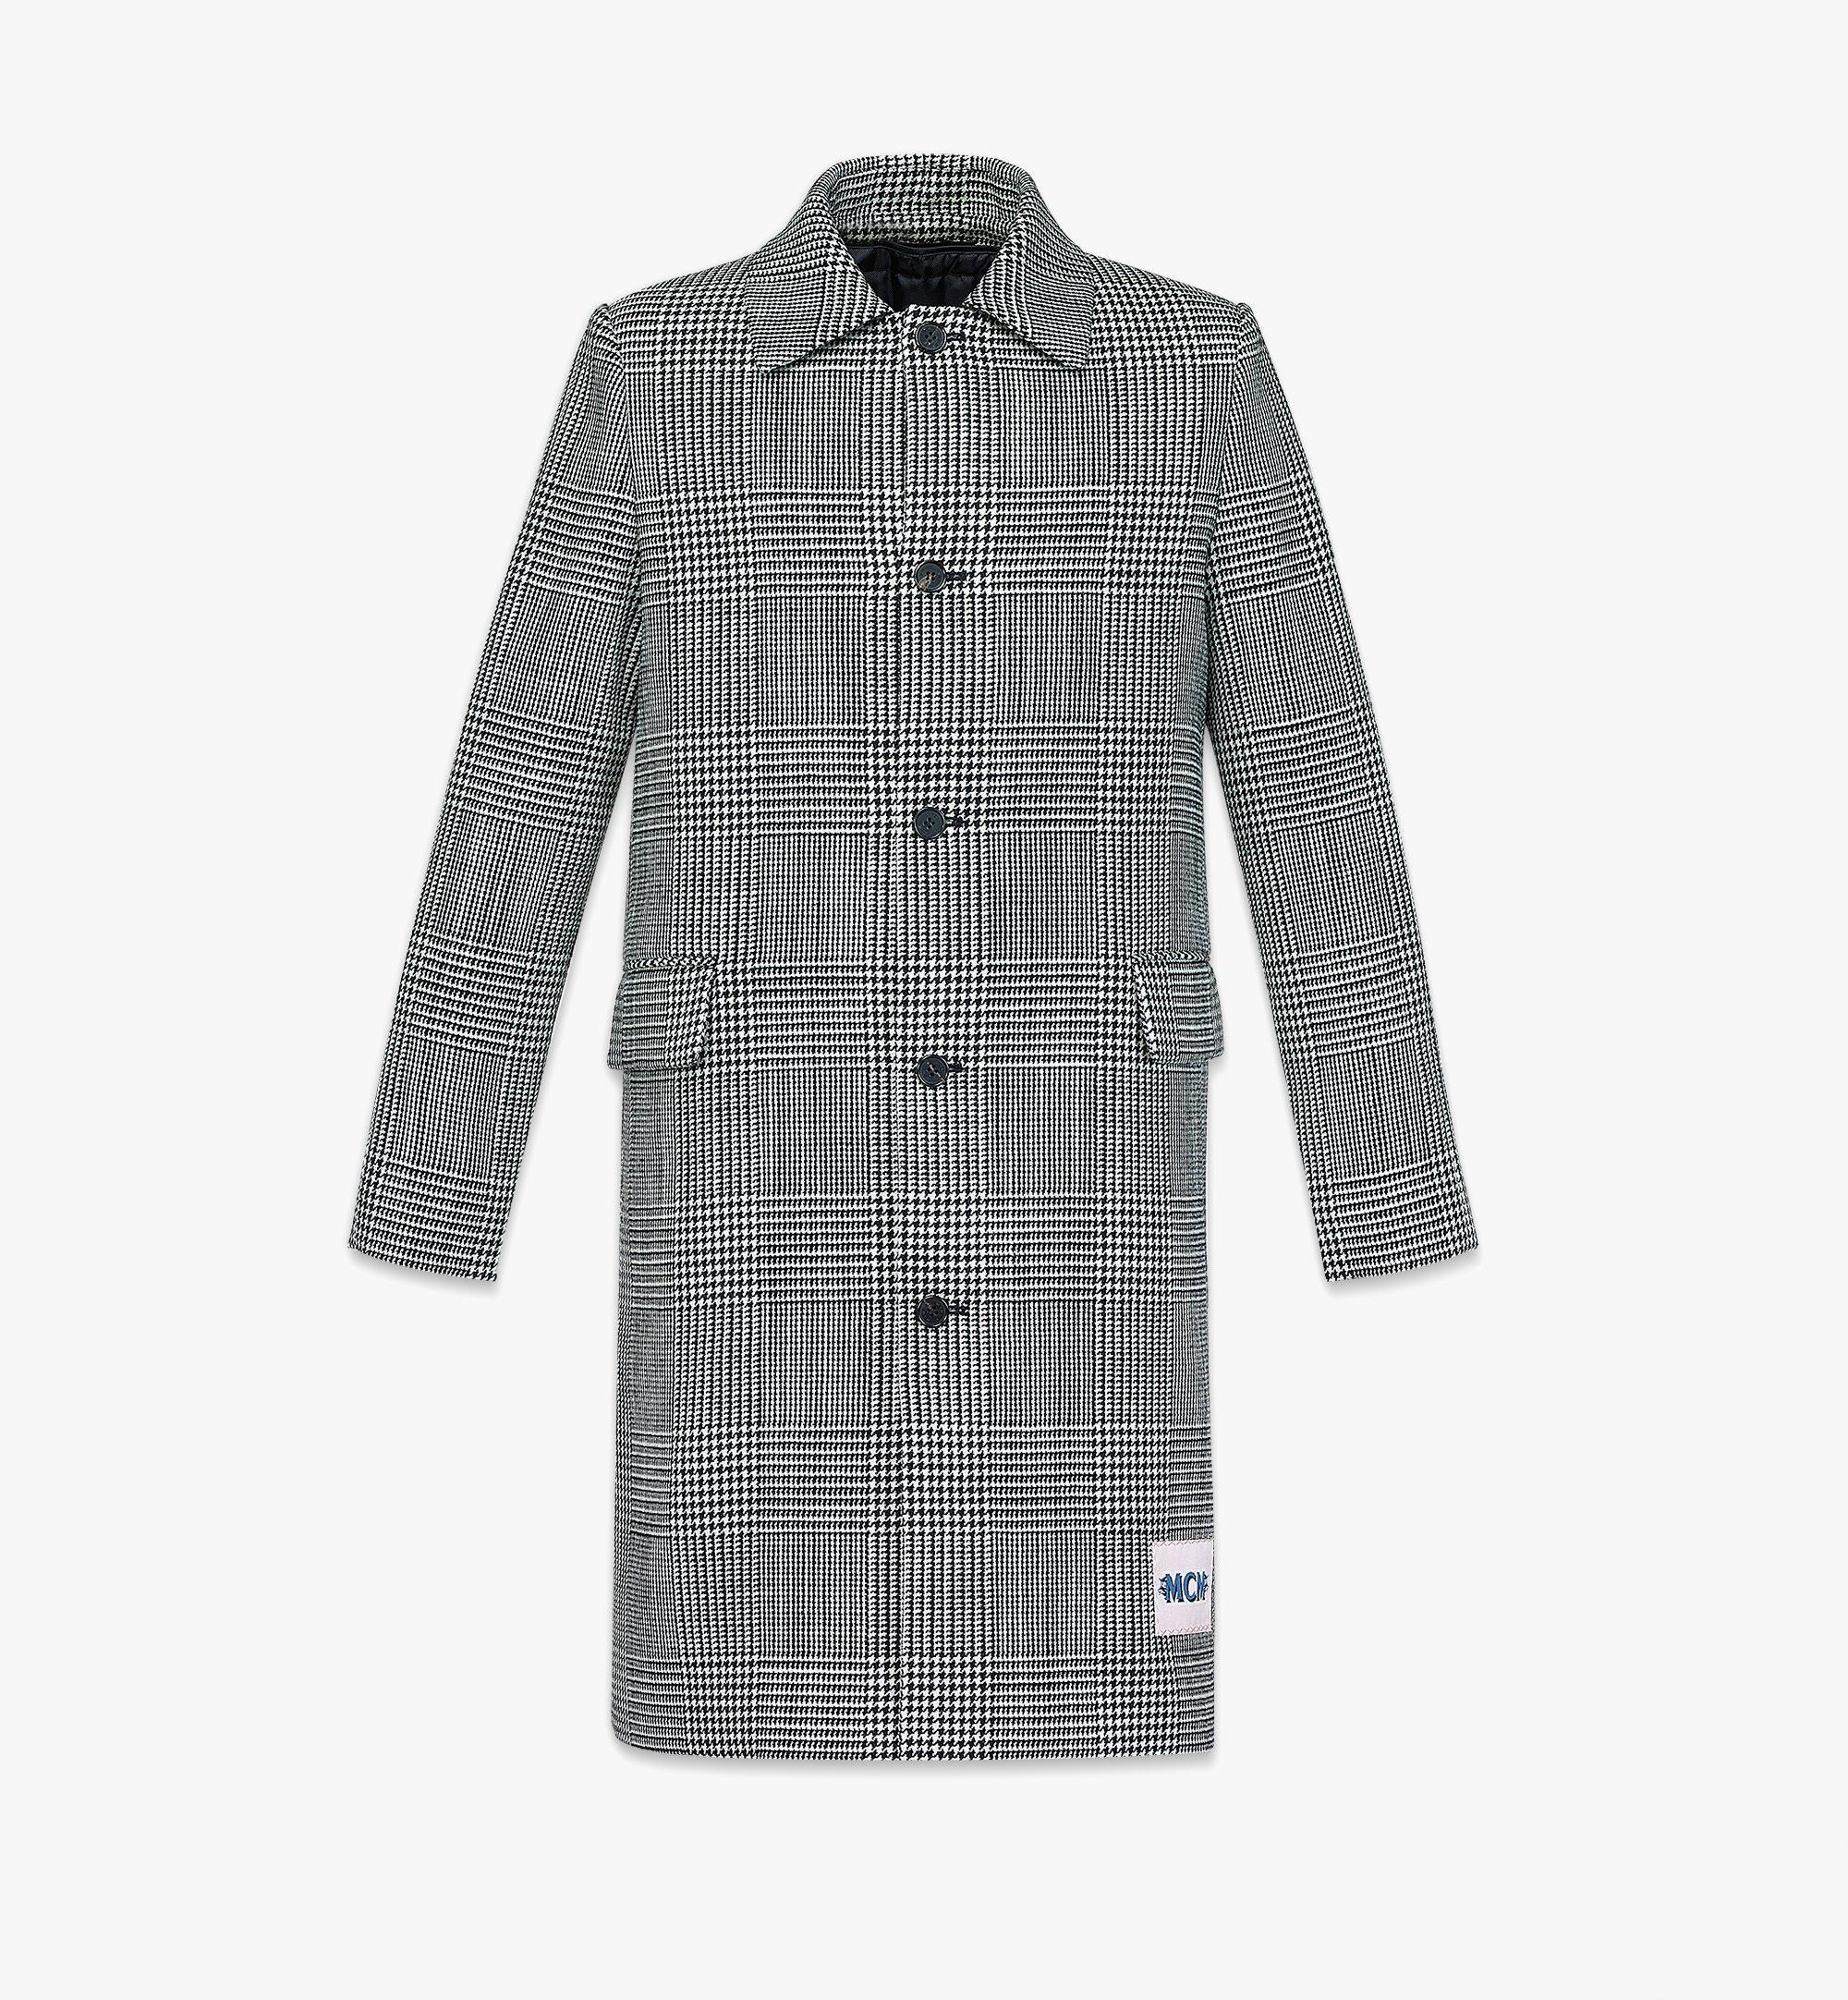 MCM Men's Check Wool Coat with Nylon Overlay Black MHCBAMM01BK046 Alternate View 2